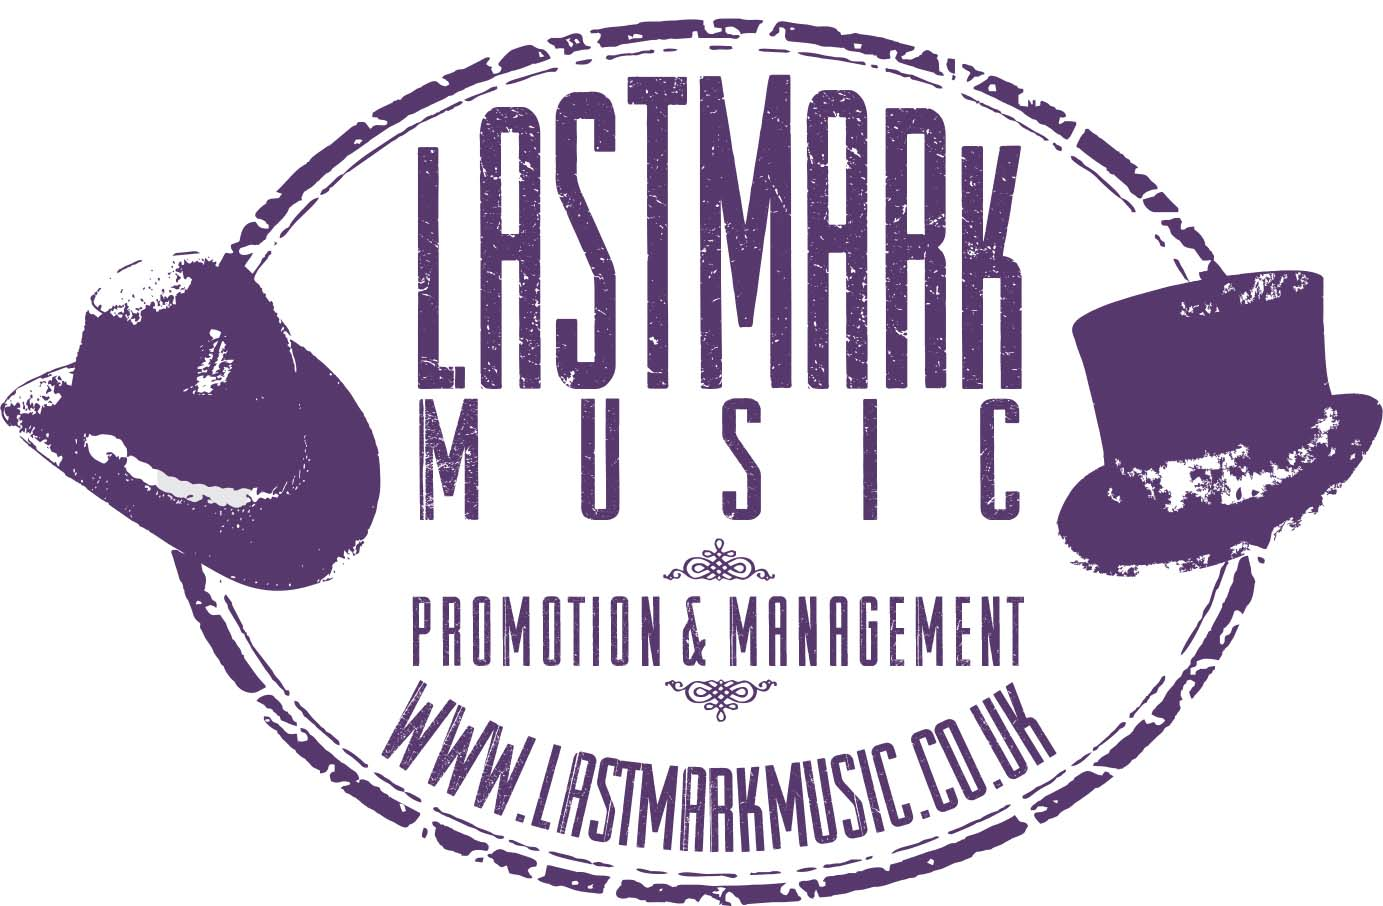 Lastmark Music